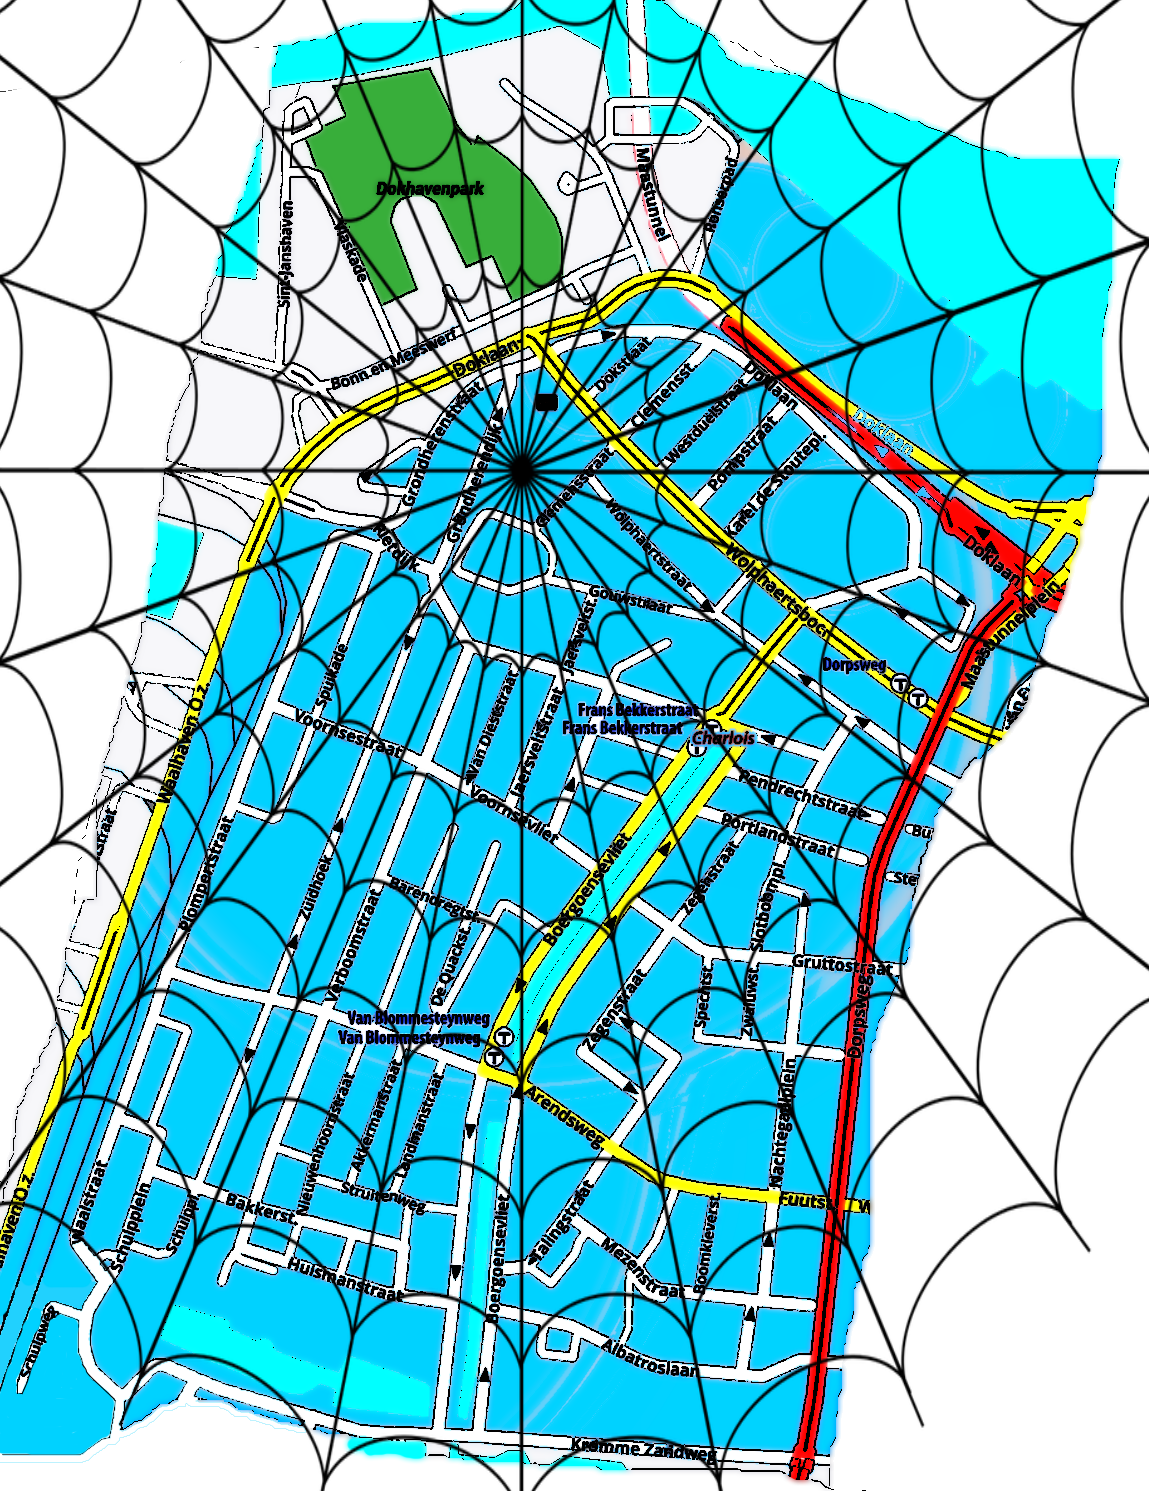 oude-kaart-werkgroep-oud-charlois-rotterdam